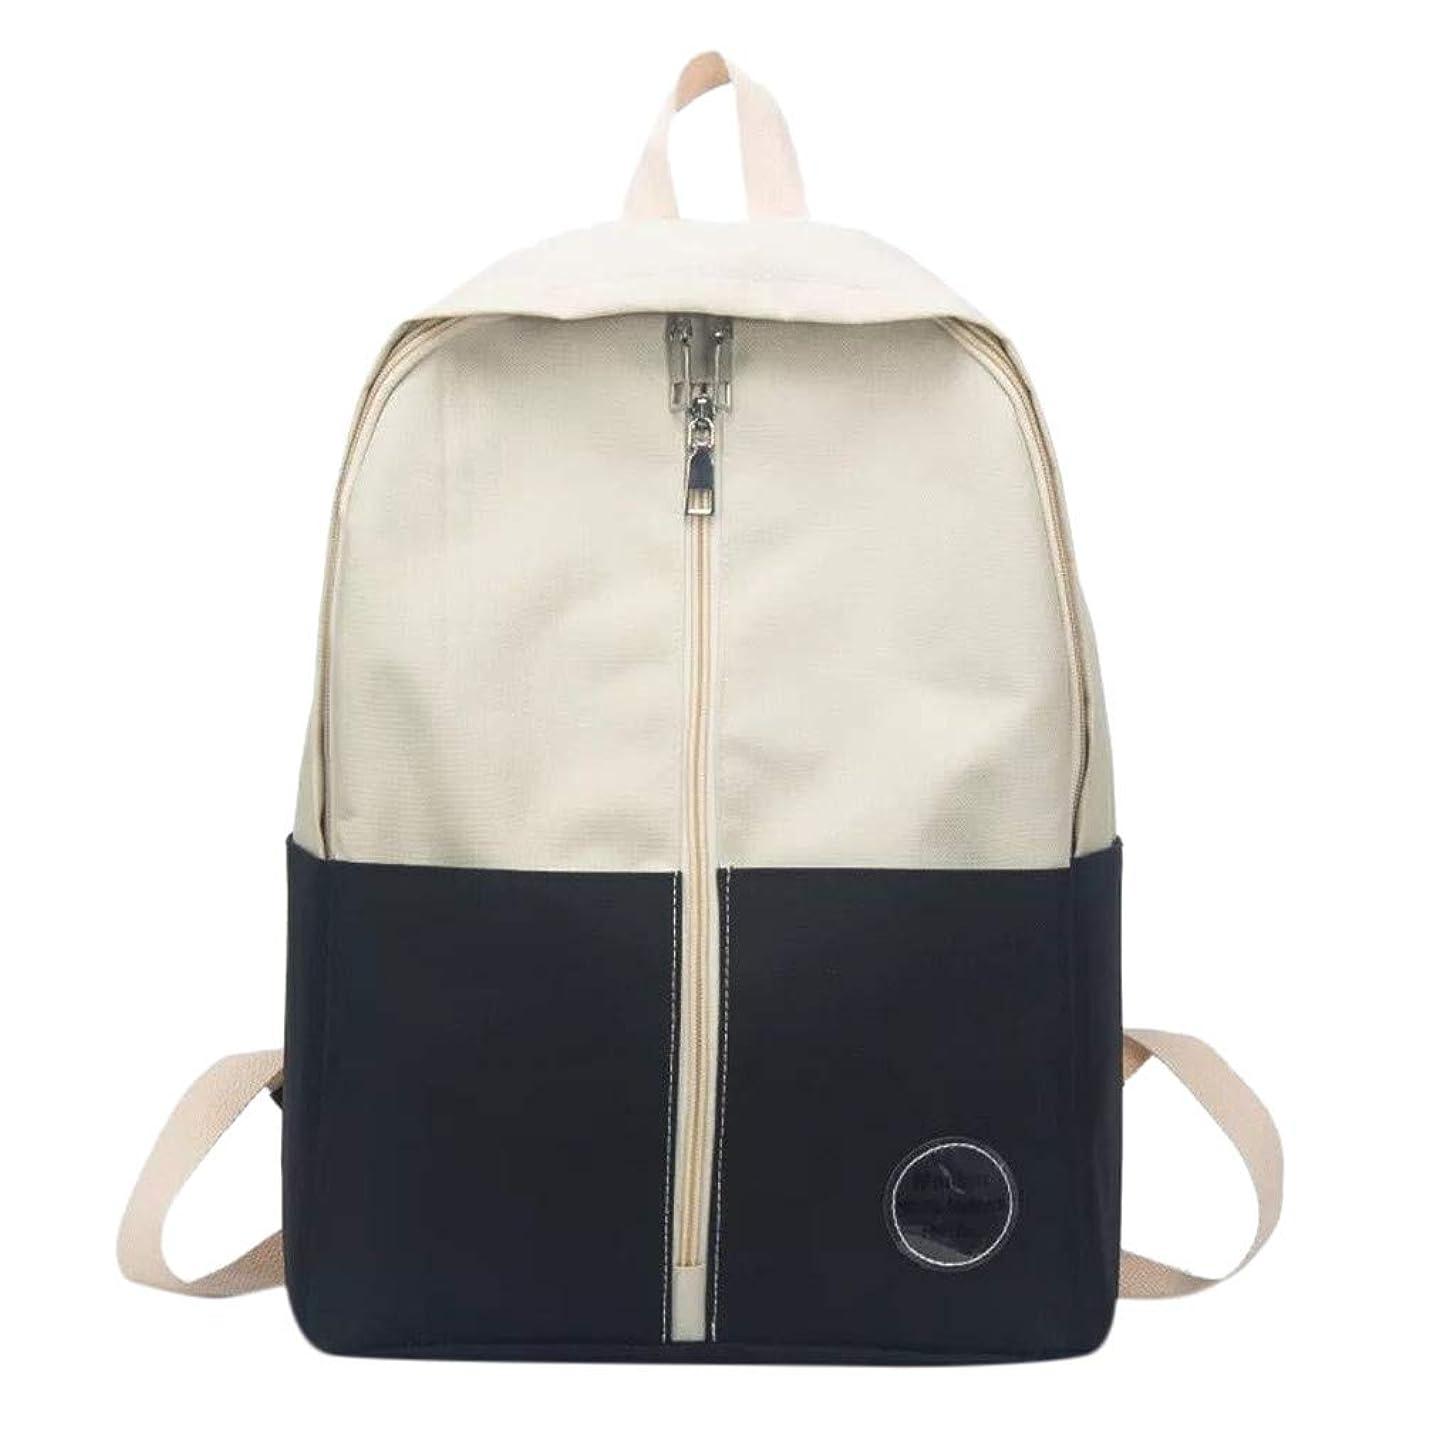 Muti-Pocket Backpack for Women/Girls, Pesonality Canvas Rucksack Large Capacity Schoolbag Mutifunction Travel Bookbag by Vielgluck